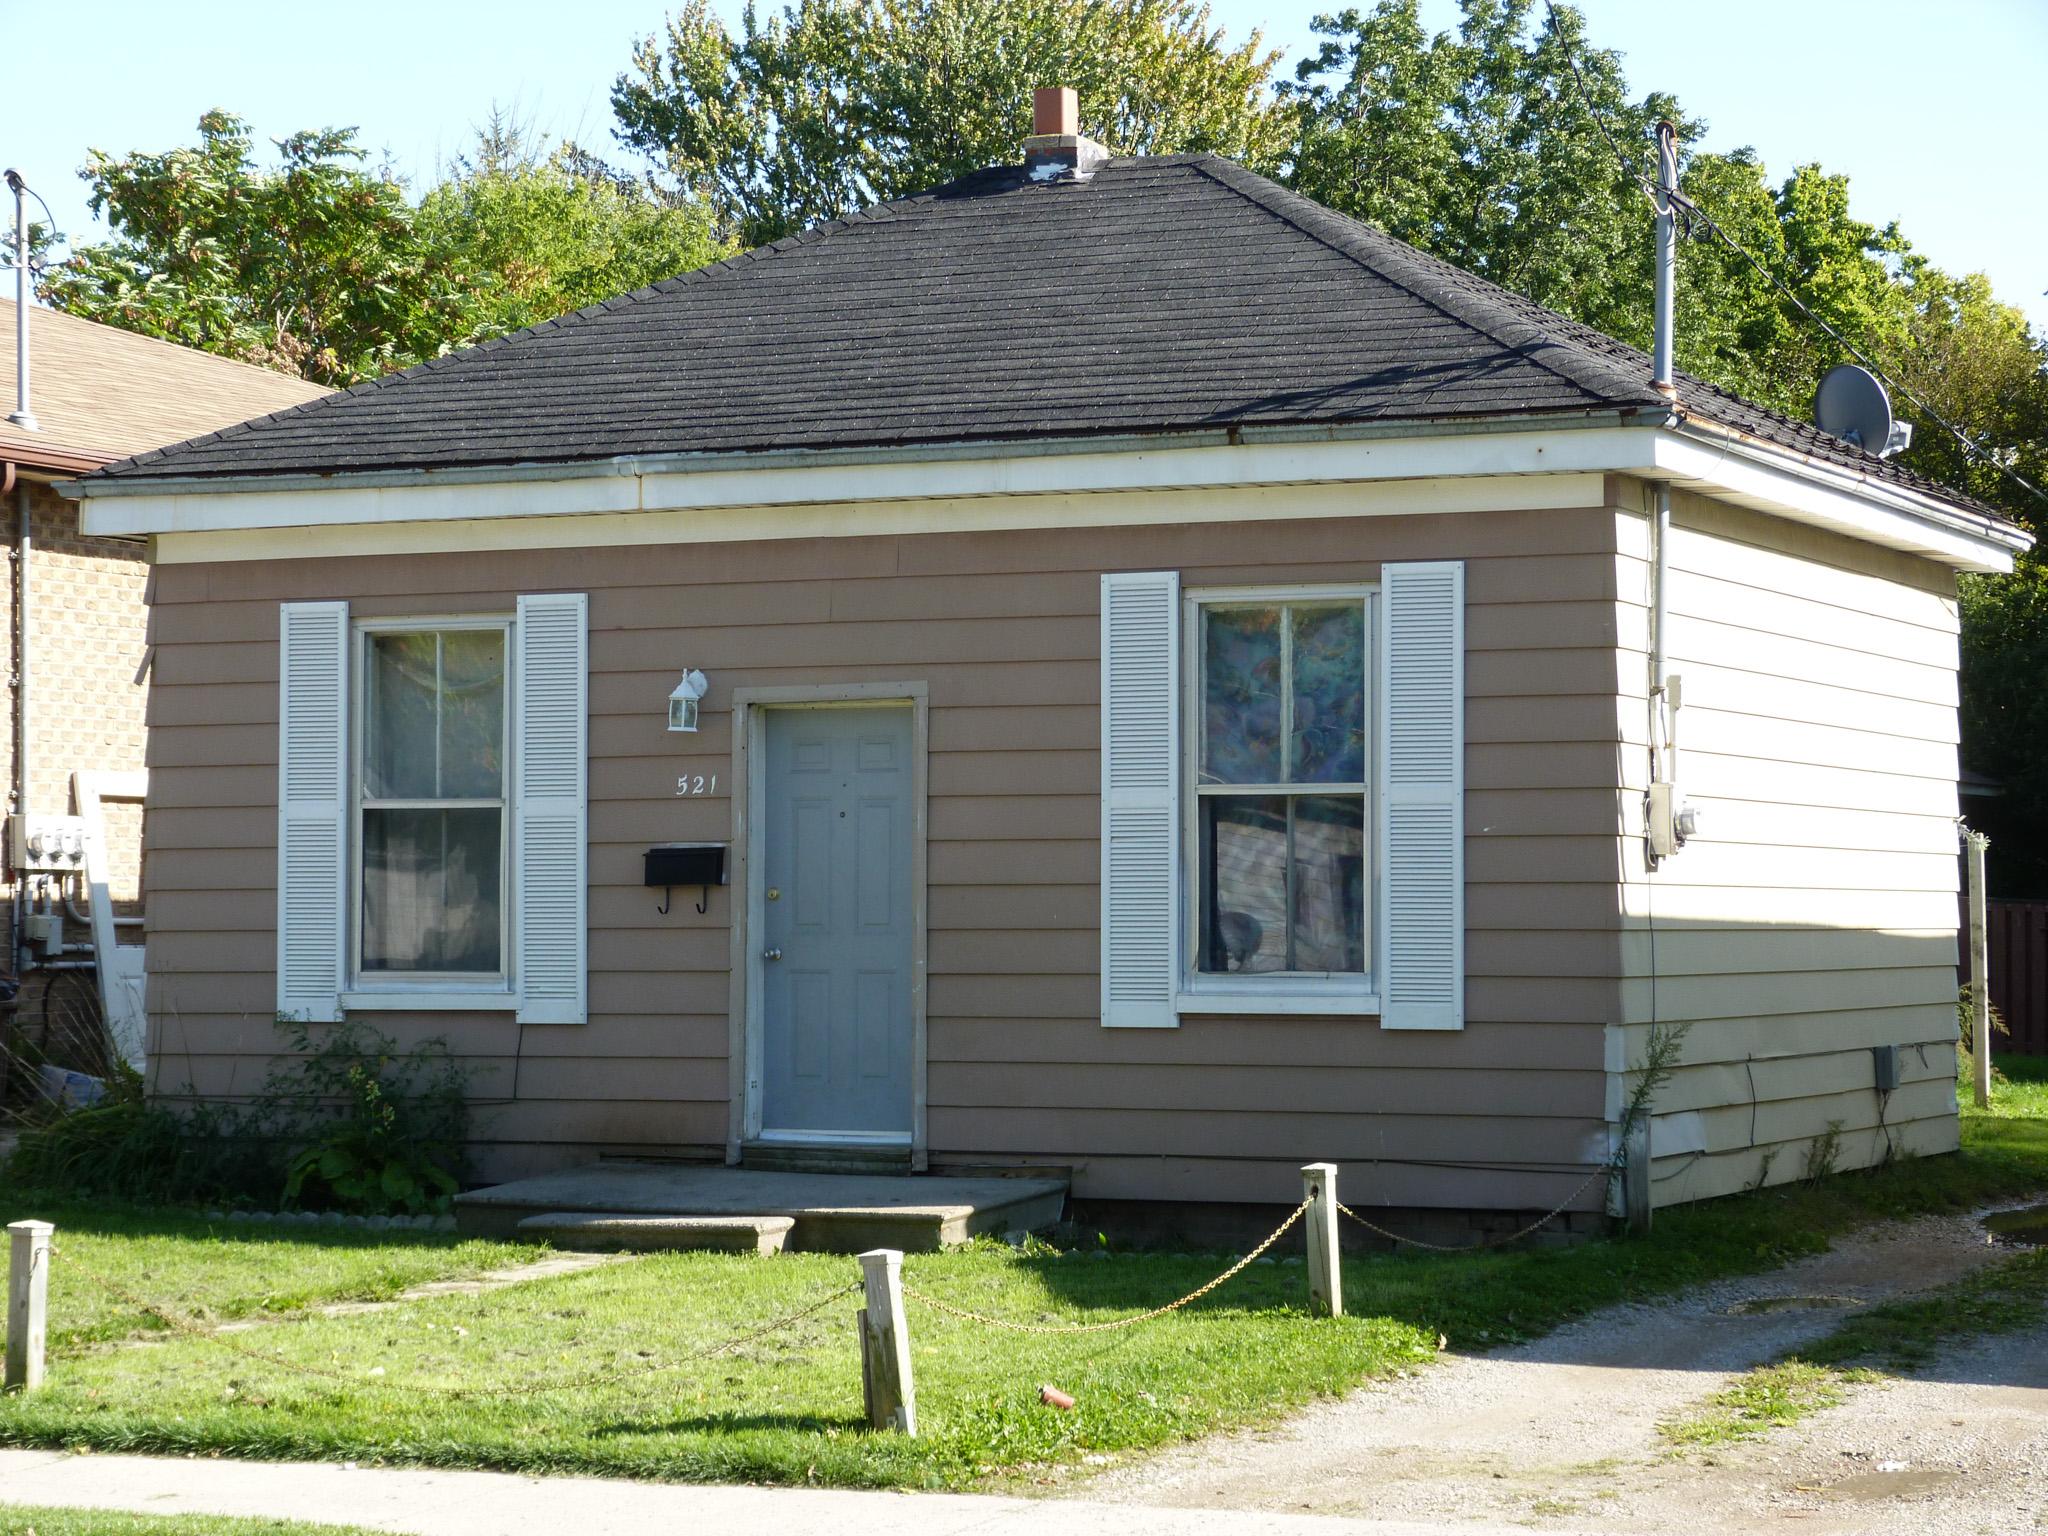 521 Simcoe in London, Ontario